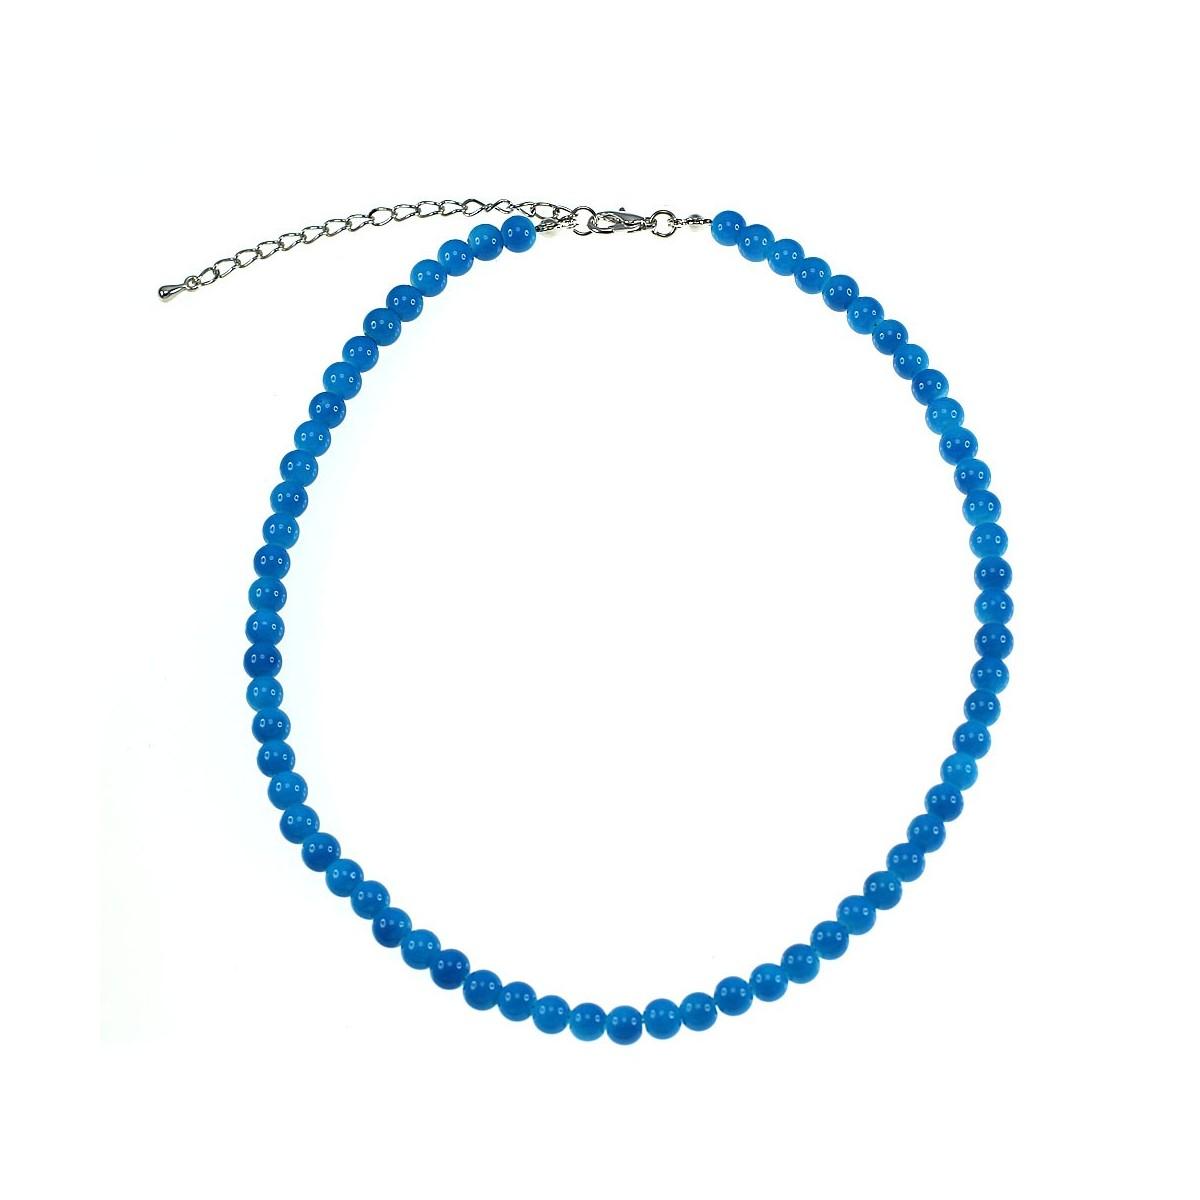 Collier perles de verre bleu